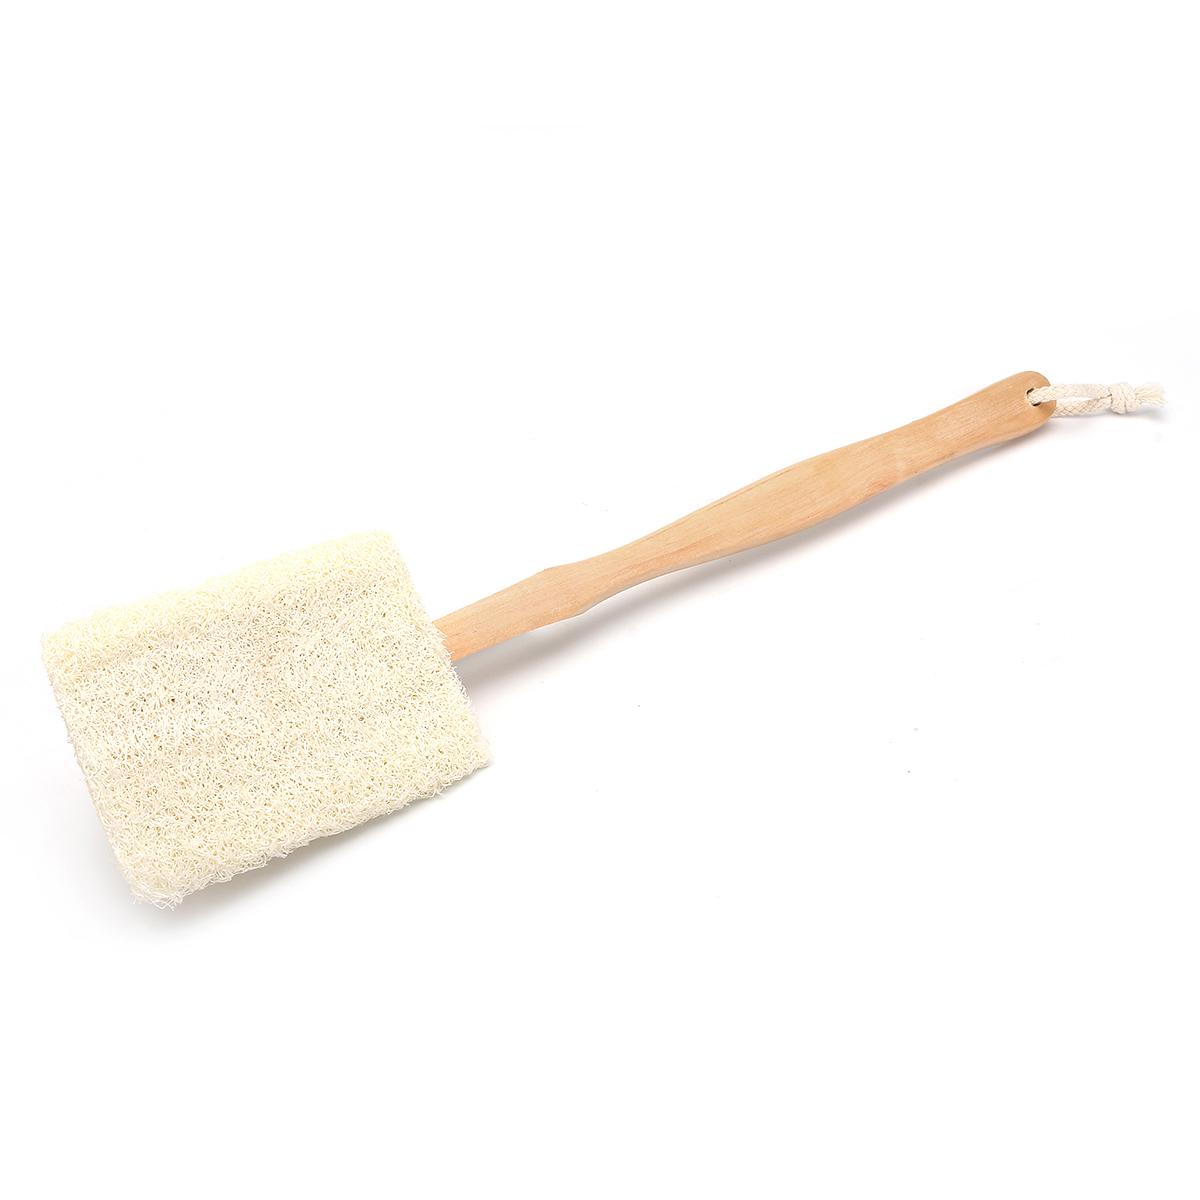 Natural luffa Loofah Bath Body Shower Spa Back Washing Scrubber Brush  Exfoliating Detachable Handle 37b03a4bdc11